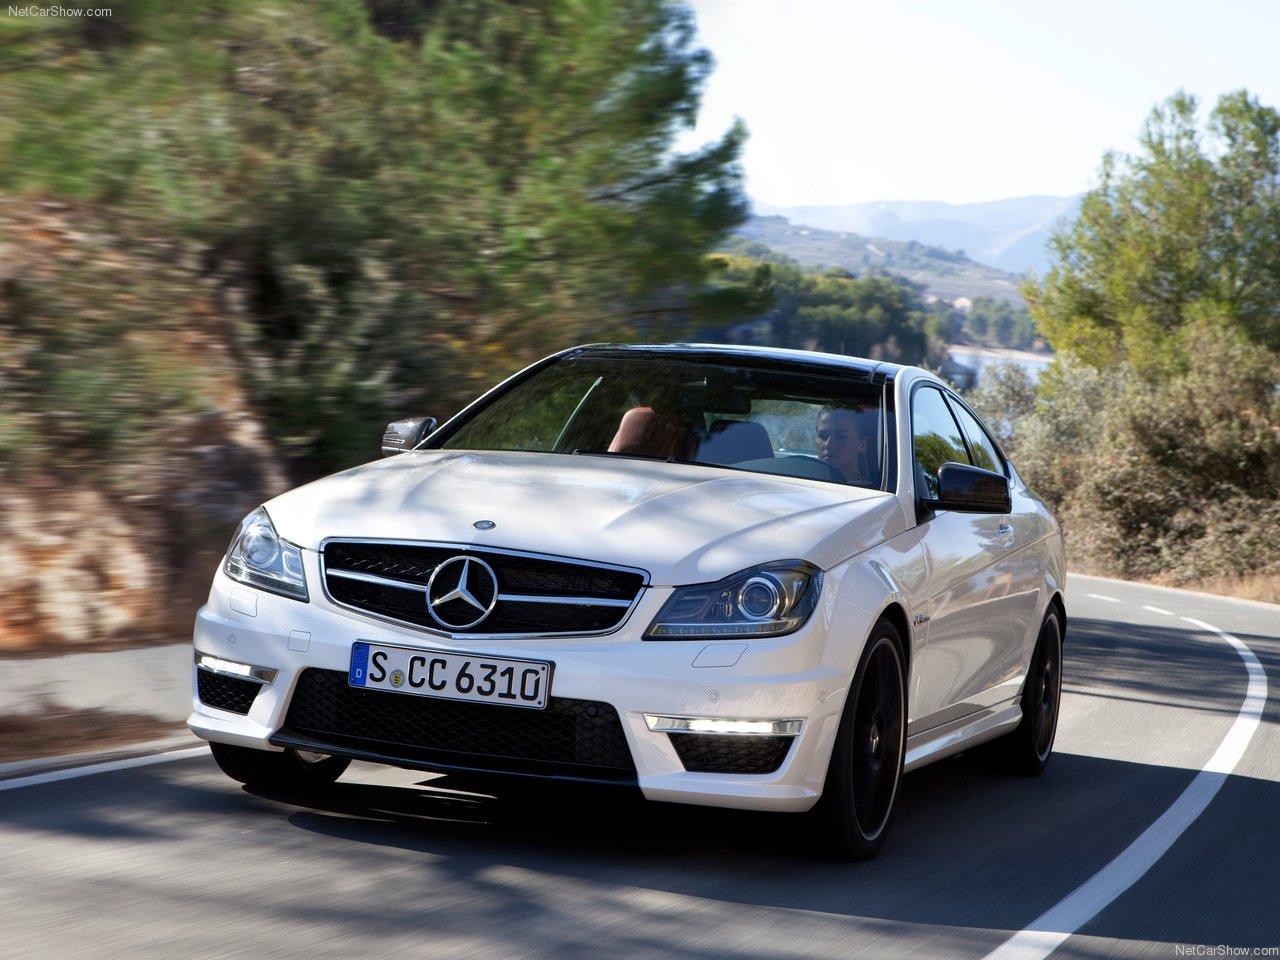 http://1.bp.blogspot.com/-HWWYP5hcyRo/TYYbw60VszI/AAAAAAAAN3M/qoFoDgtCDYE/s1600/Mercedes-Benz-C63_AMG_Coupe_2012_1280x960_wallpaper_01.jpg